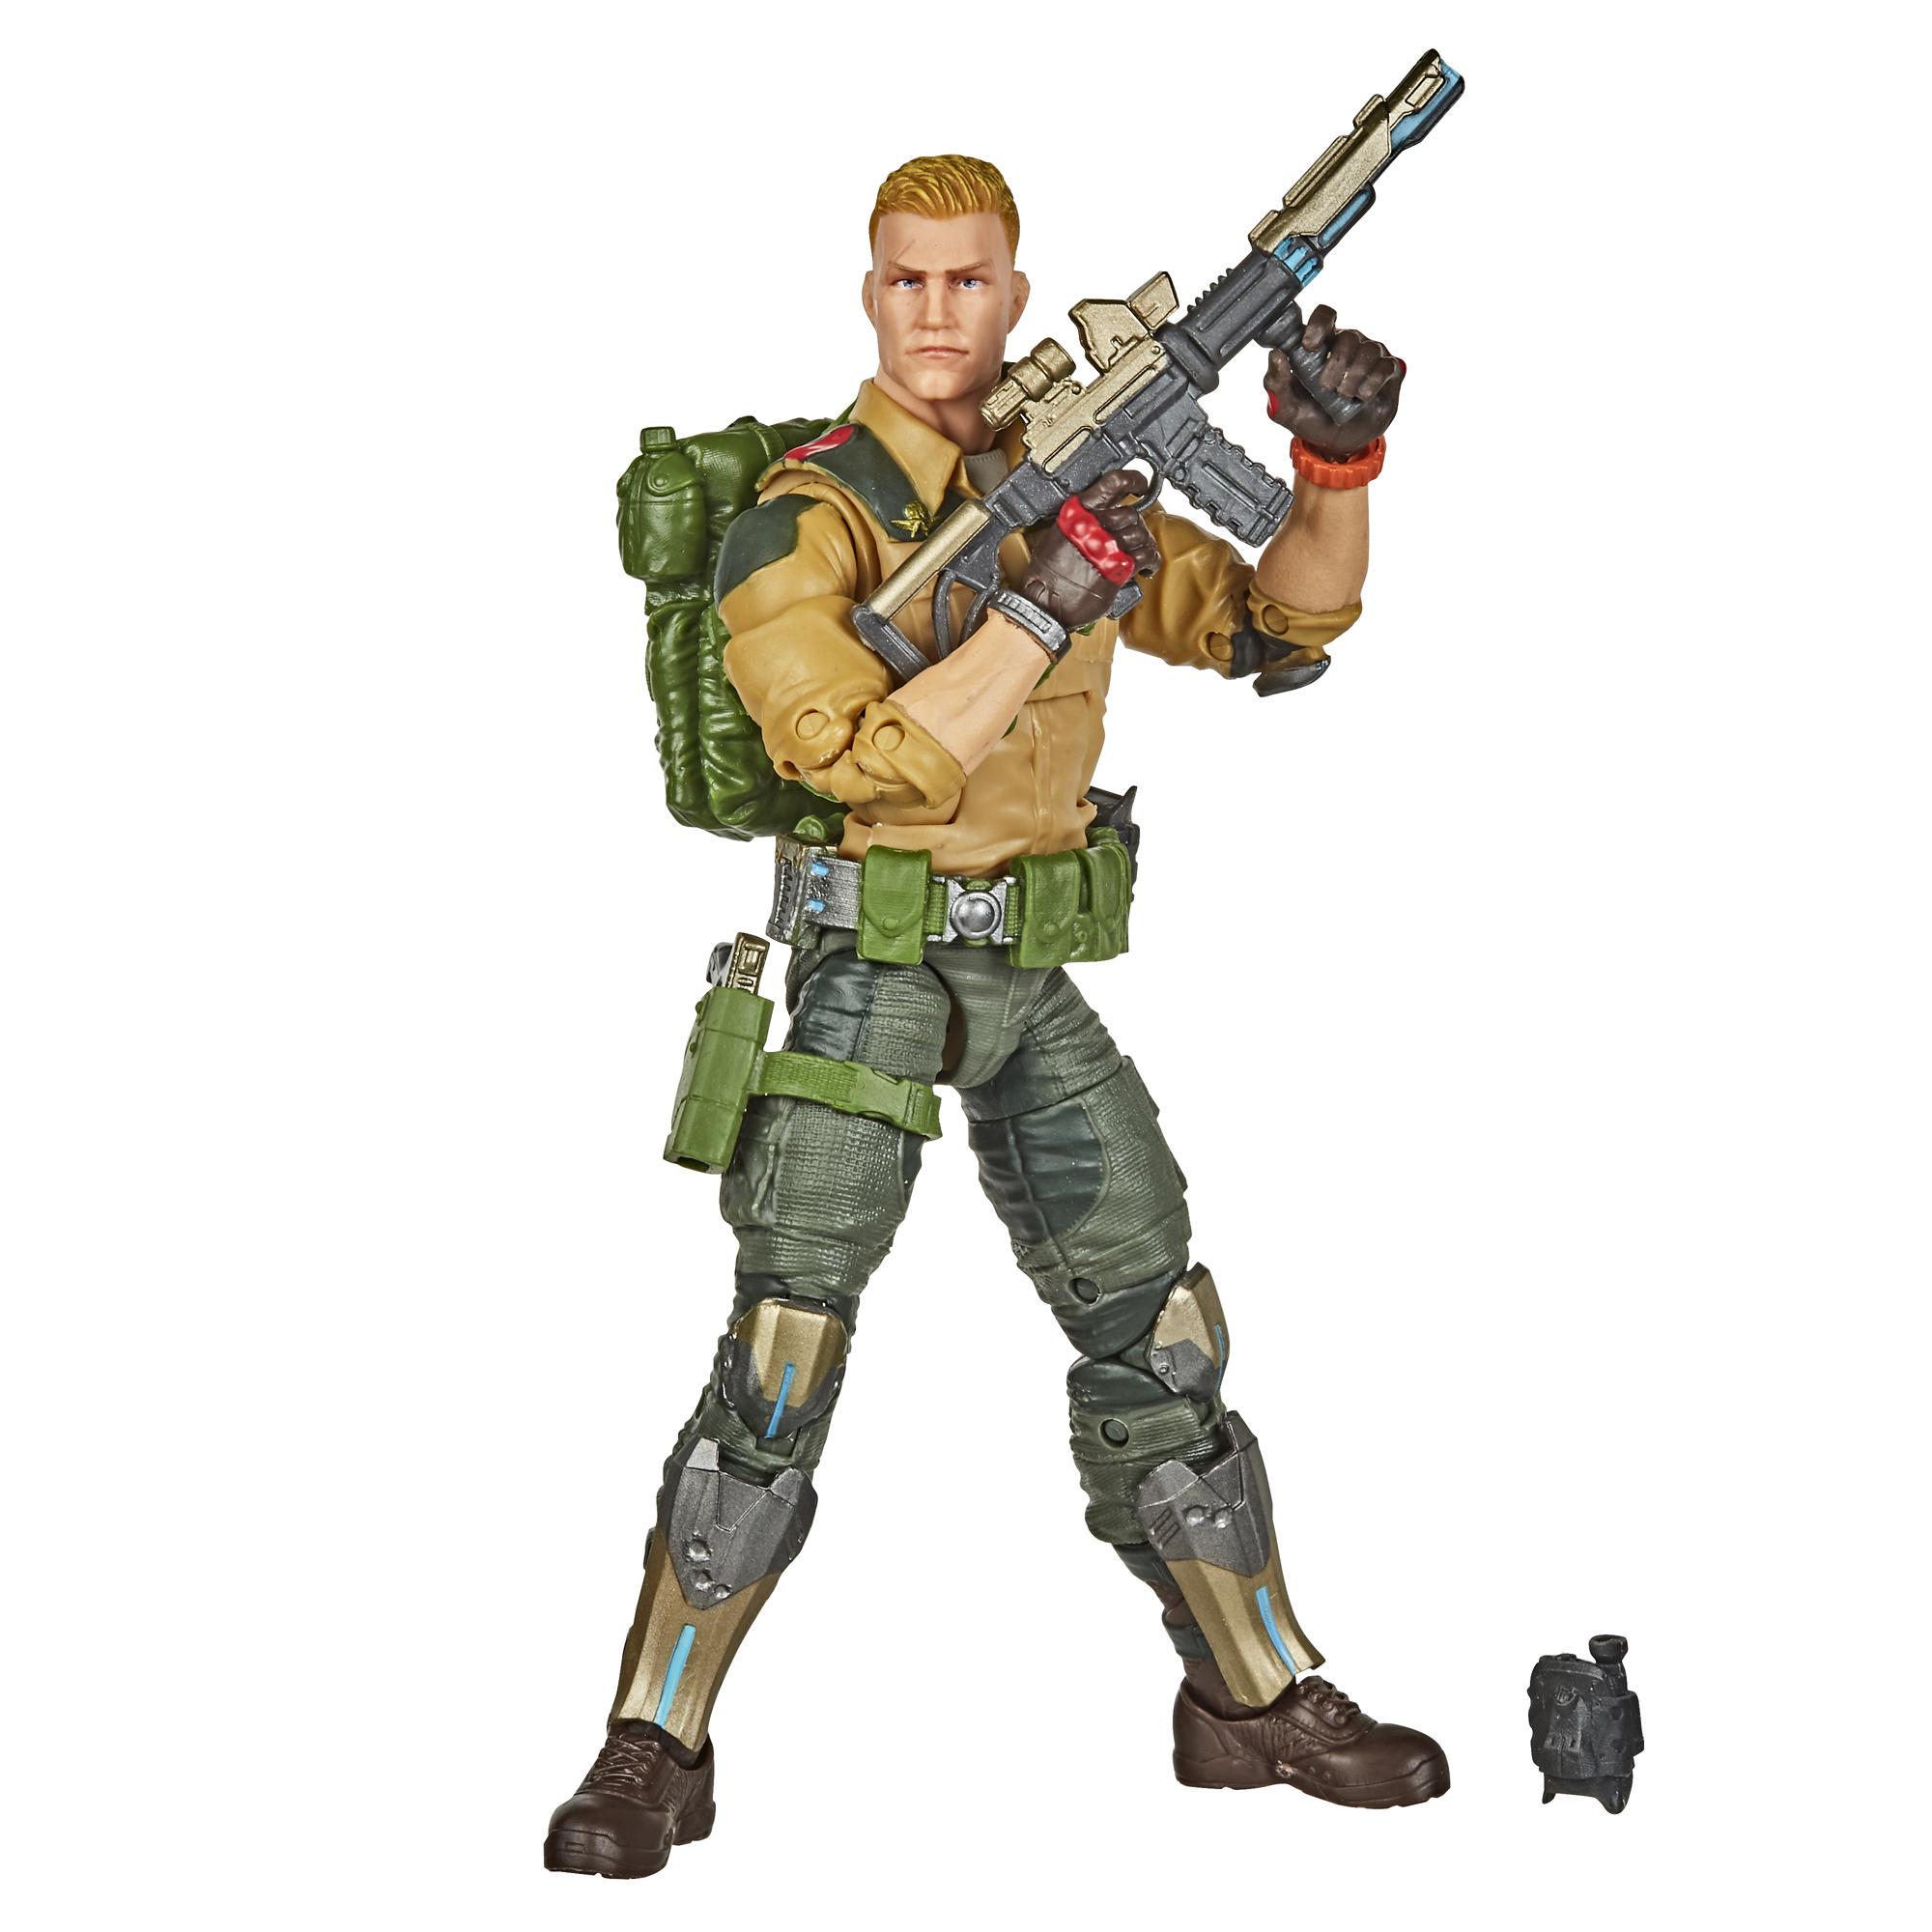 G.I. Joe Classified Series - Figura Duke 04 con múltiples accesorios